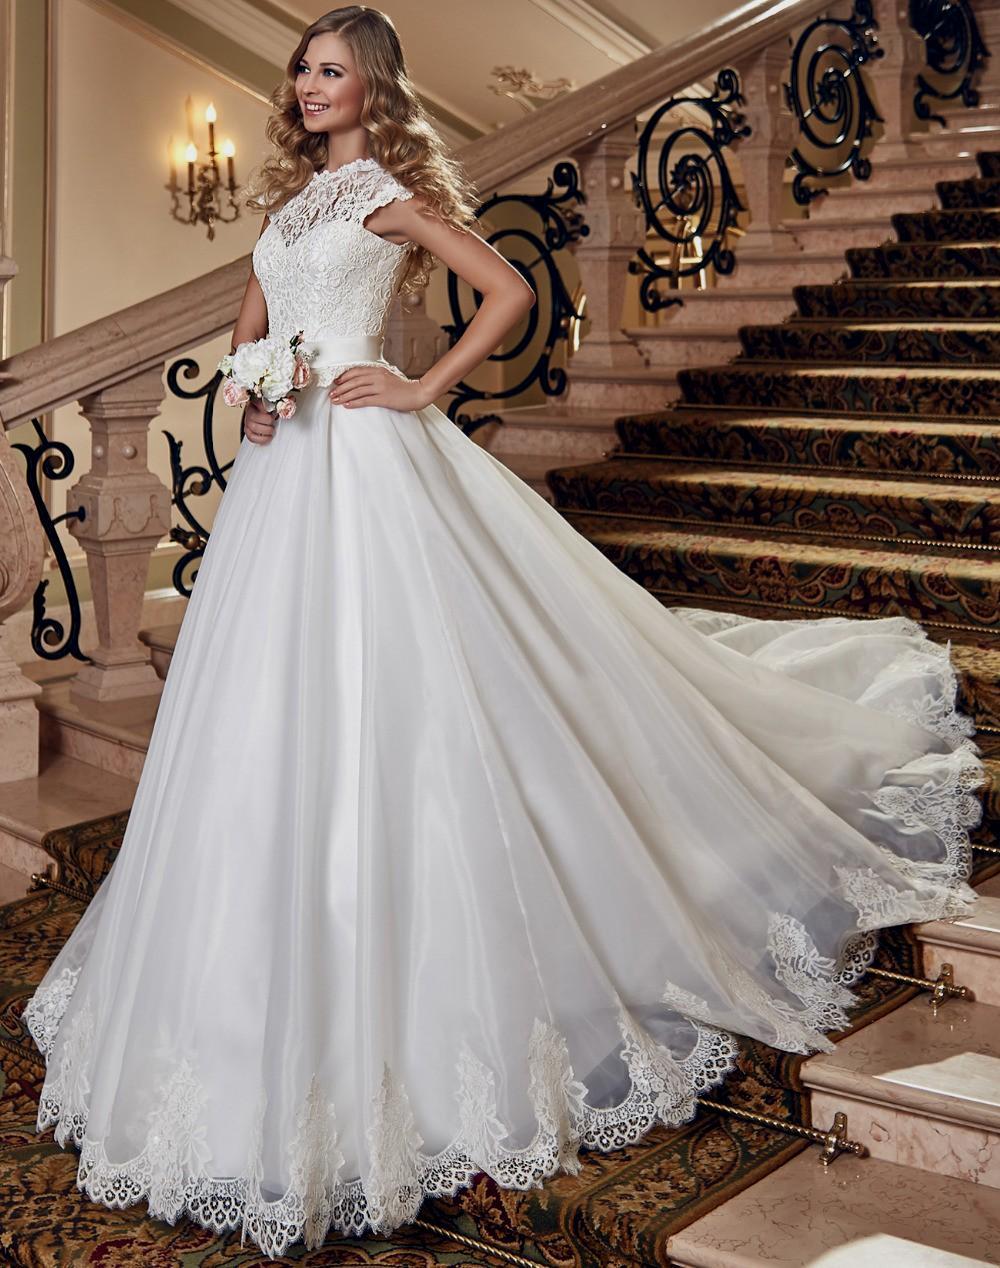 wedding dresses for broad shoulders photo - 1